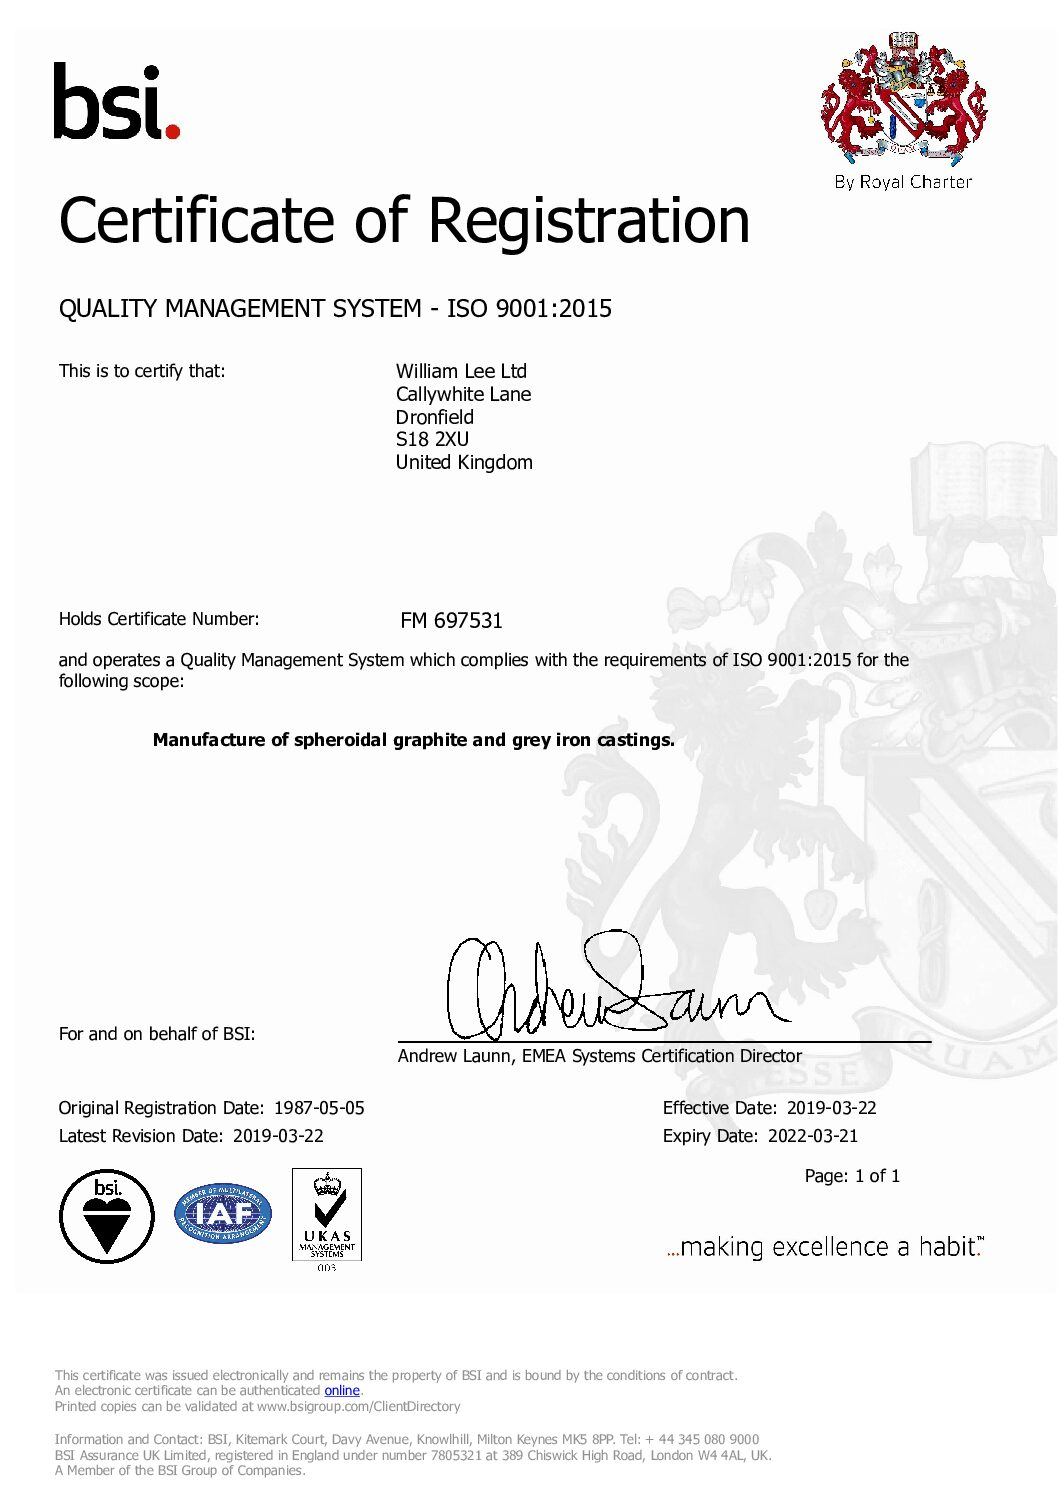 ISO9001 WMLee Mar 2019-Mar 2022 FM 697531